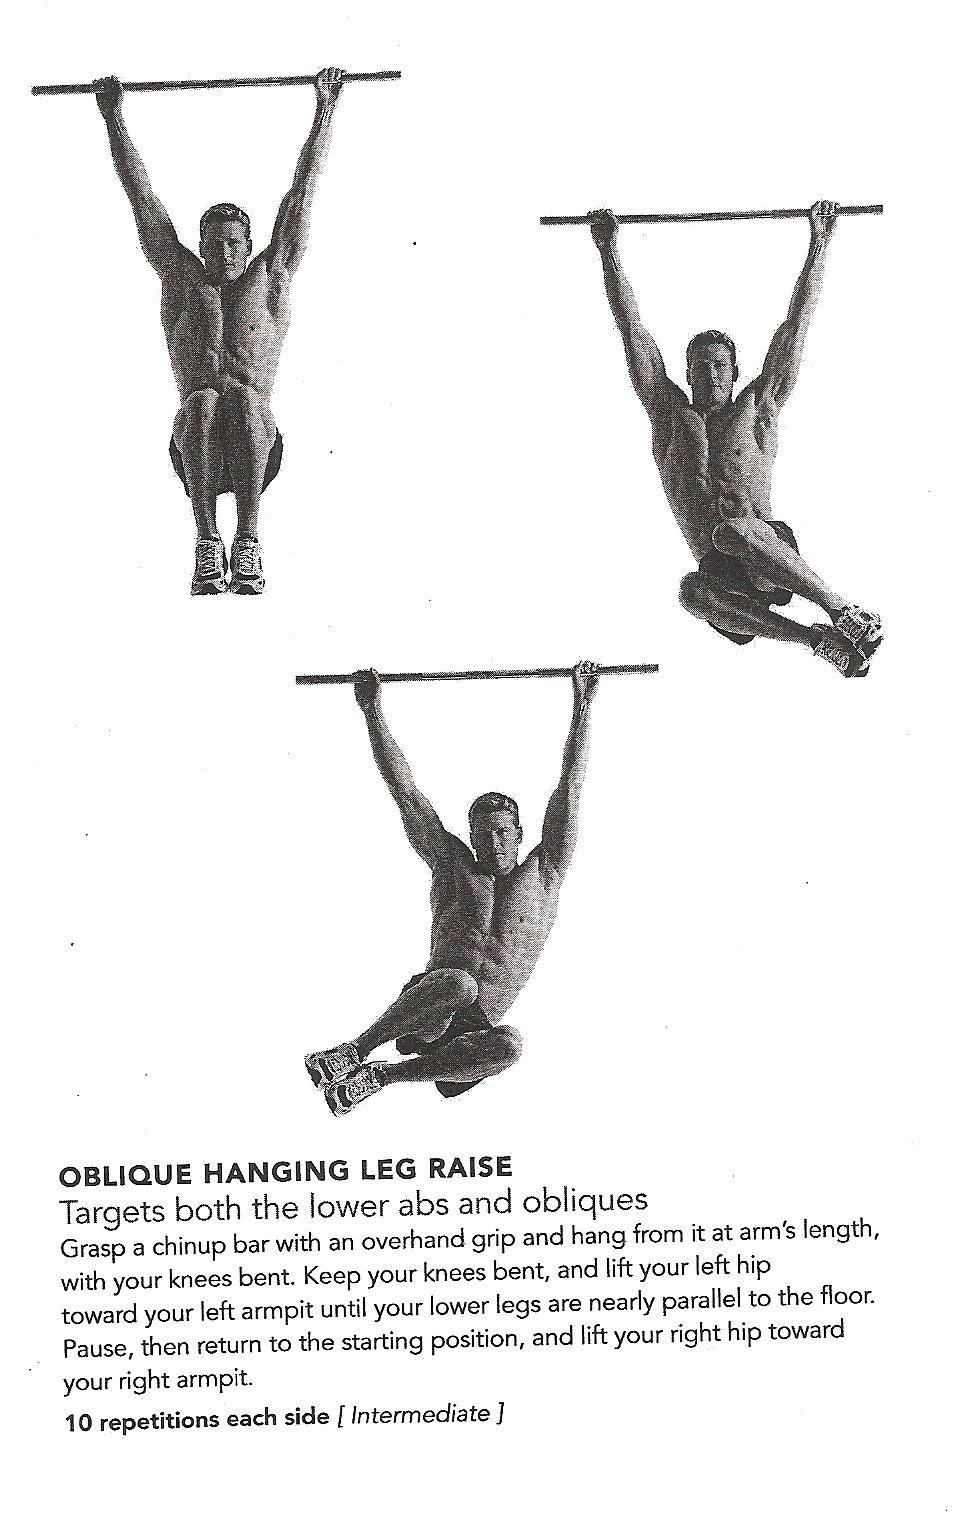 oblique hanging leg raise fitness motivation inspiration fitspo crossfit running workout